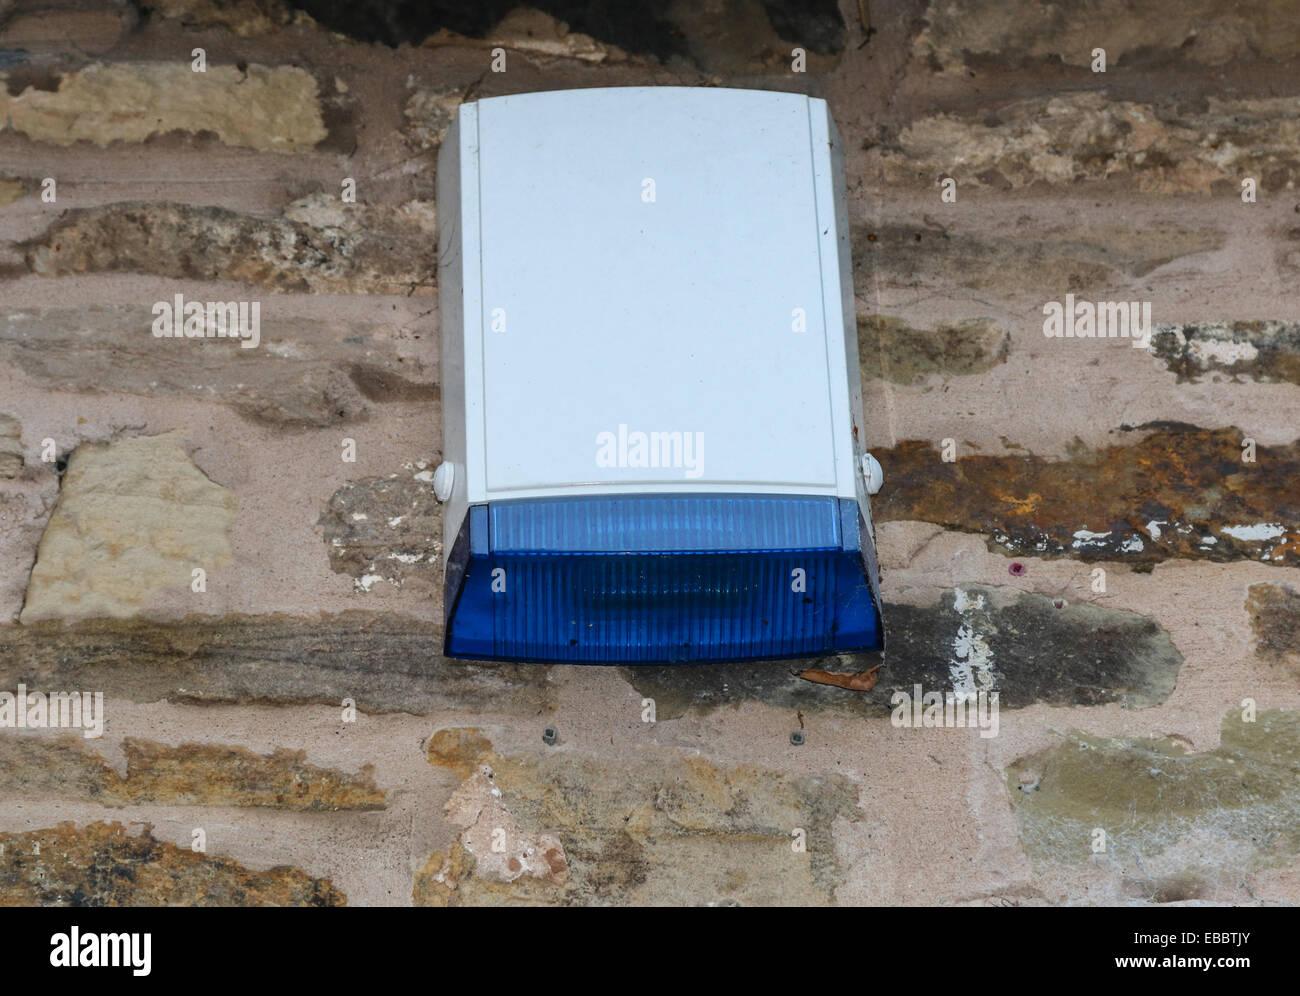 Burglar security alarm external bell box - Stock Image